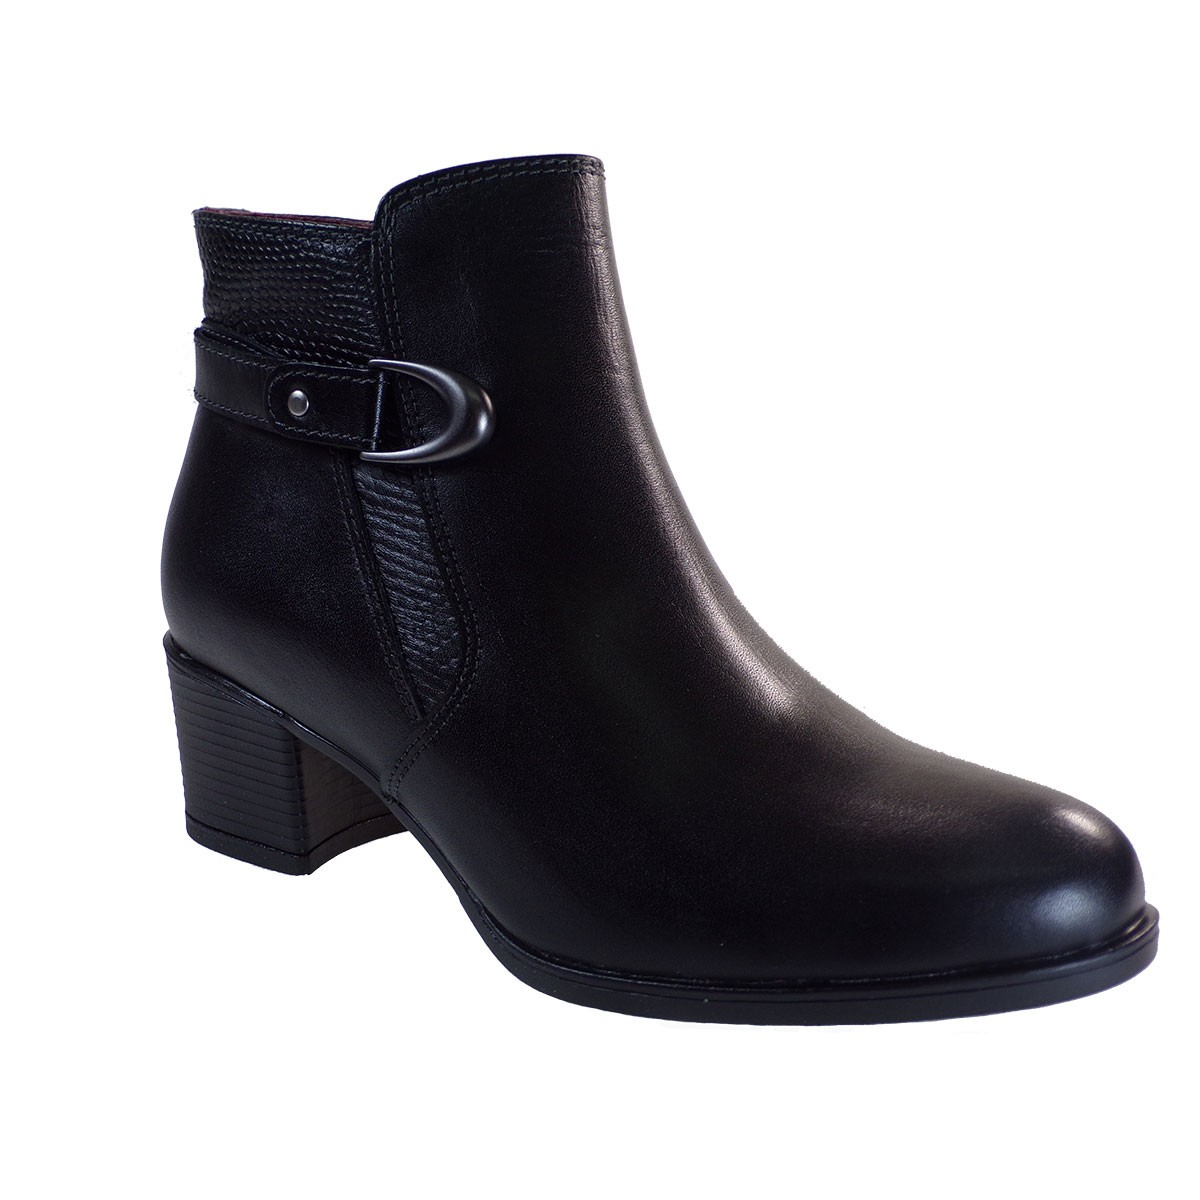 Softies Shoes Γυναικείες Μποτάκια 7231 Μαύρο Δέρμα